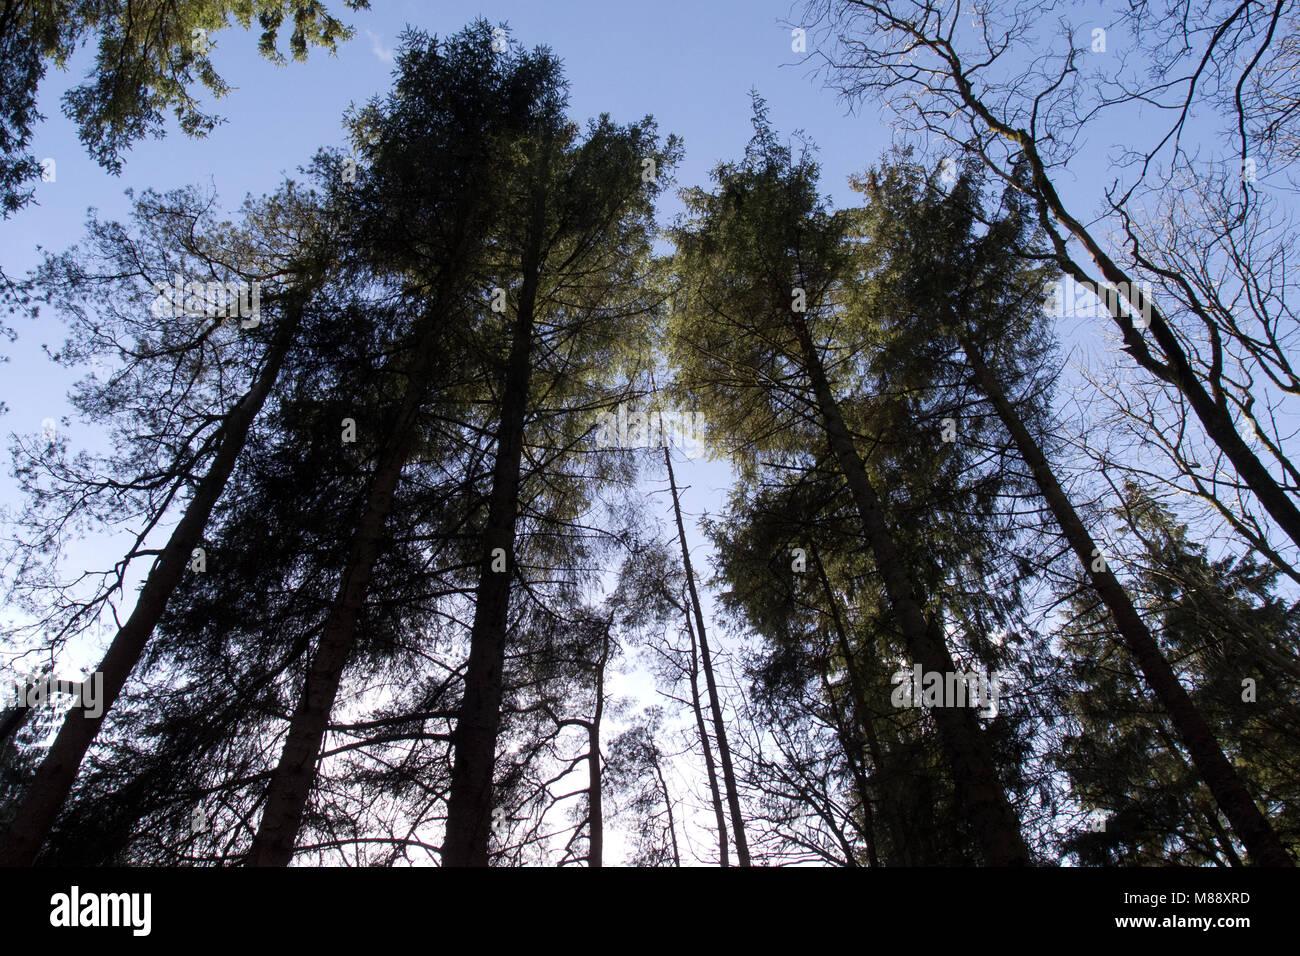 Forest on Greeto Bridge Trailhead in Largs, North Ayrshire, Scotland - Stock Image